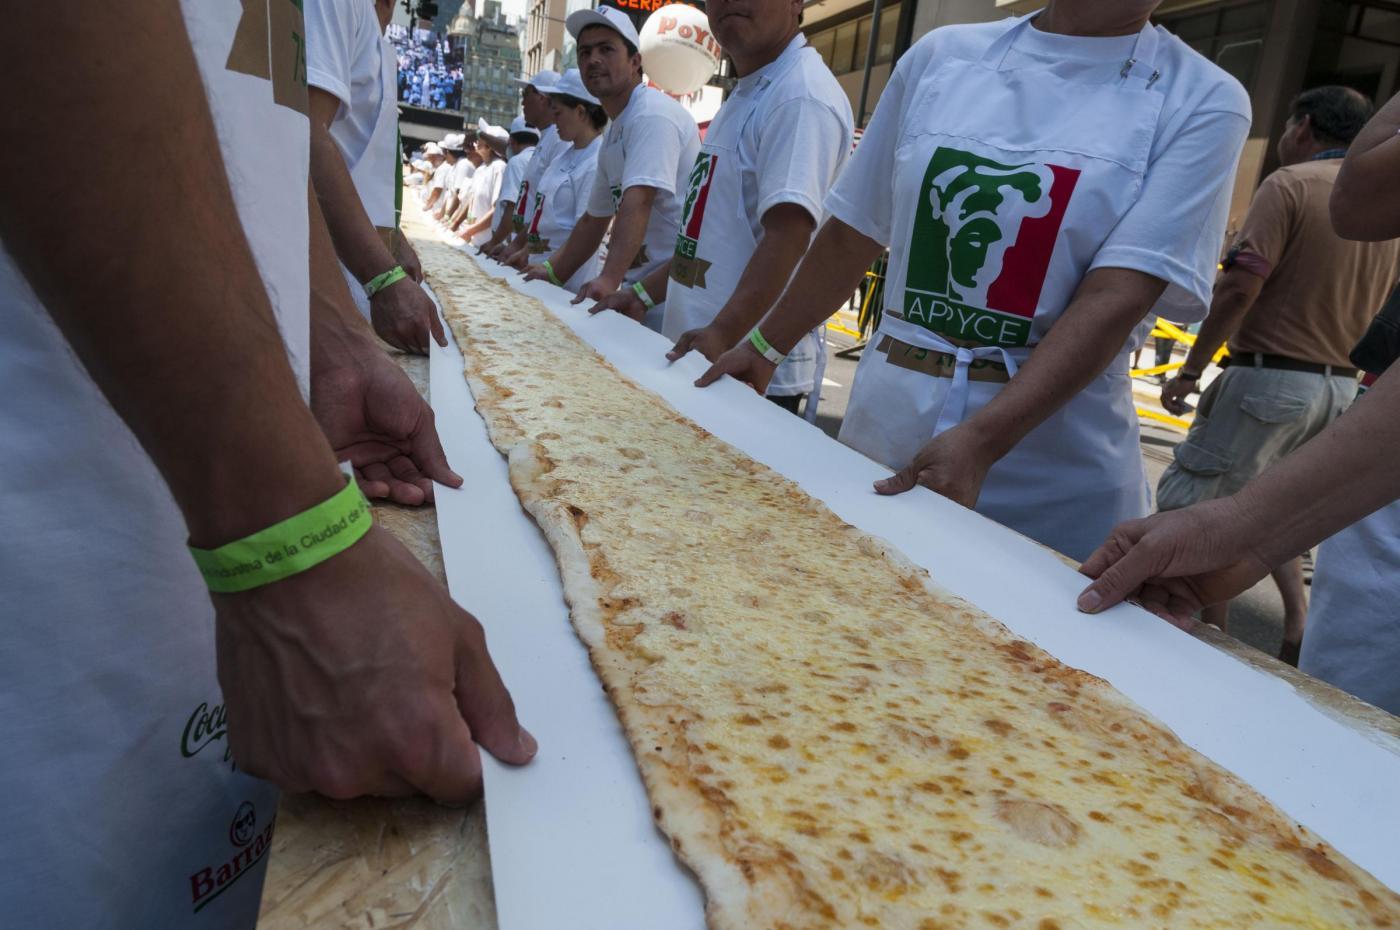 Buenos Aires, la pizza lunga 50 metri venduta per beneficenza10